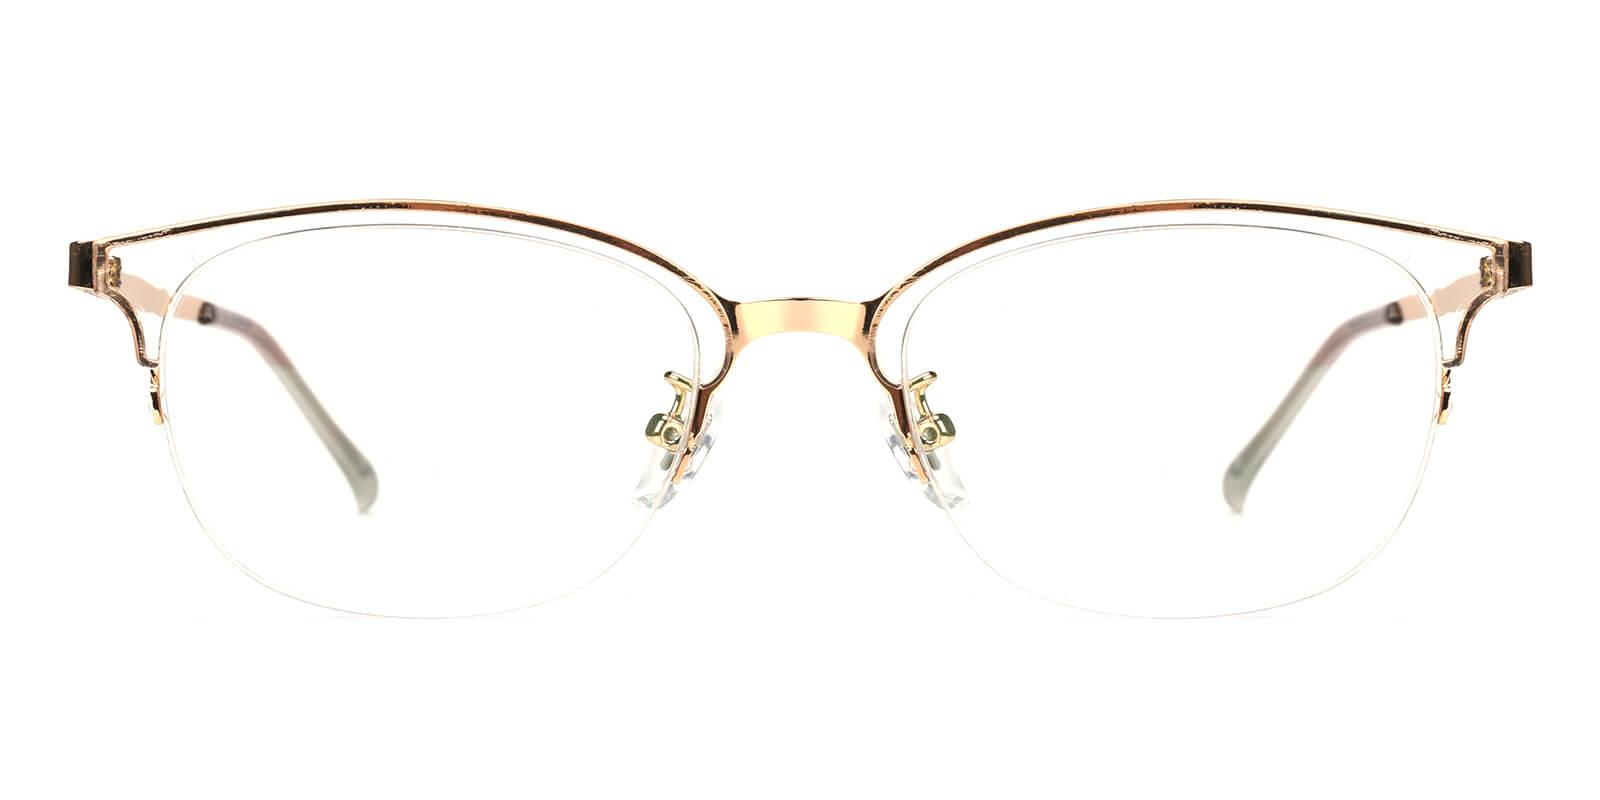 Snob-Gold-Browline-Combination-Eyeglasses-detail